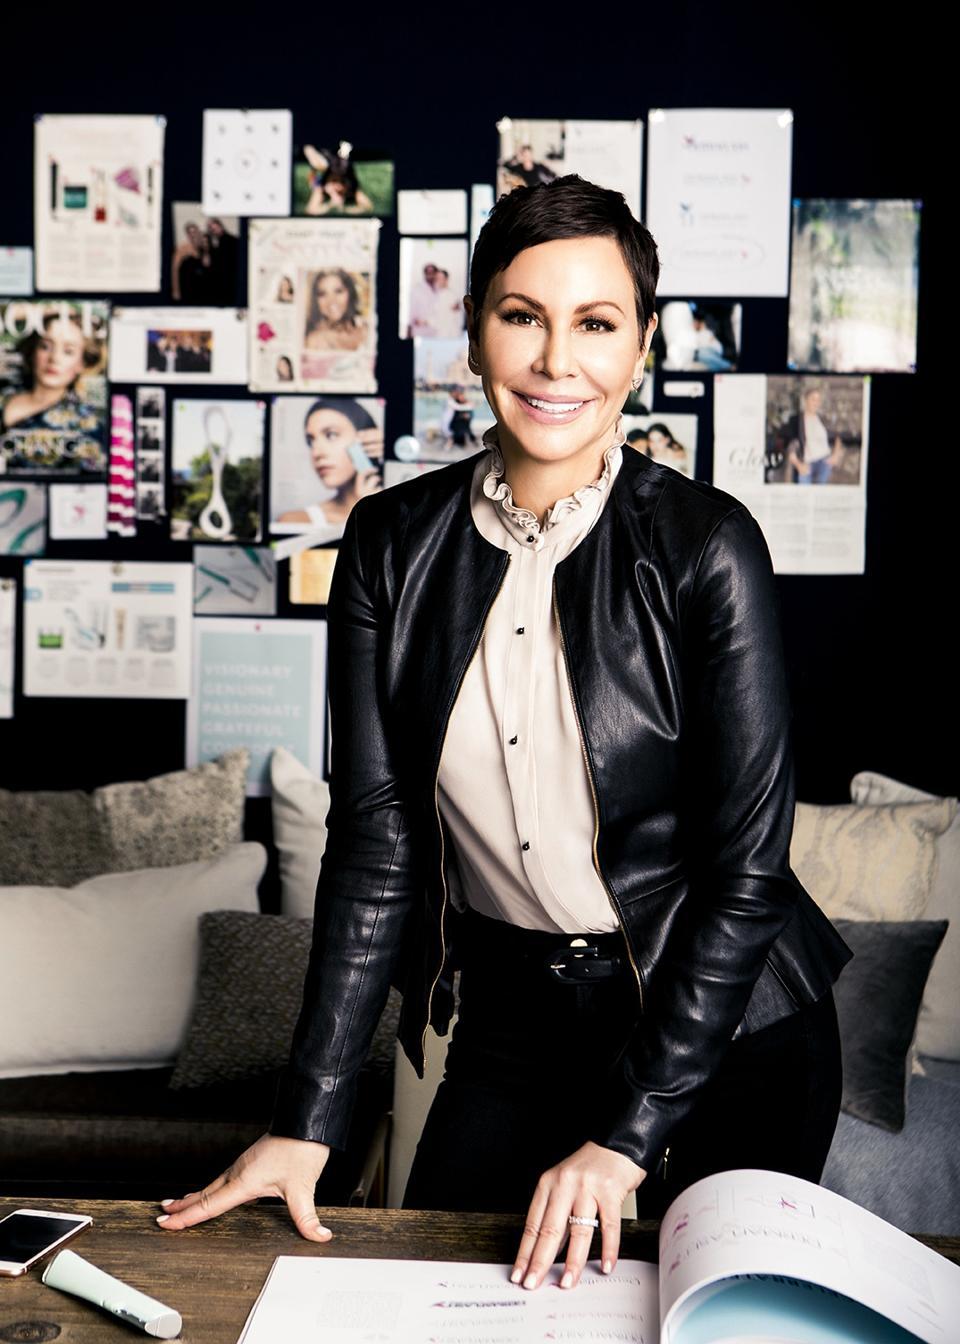 DERMAFLASH founder Dara Levy